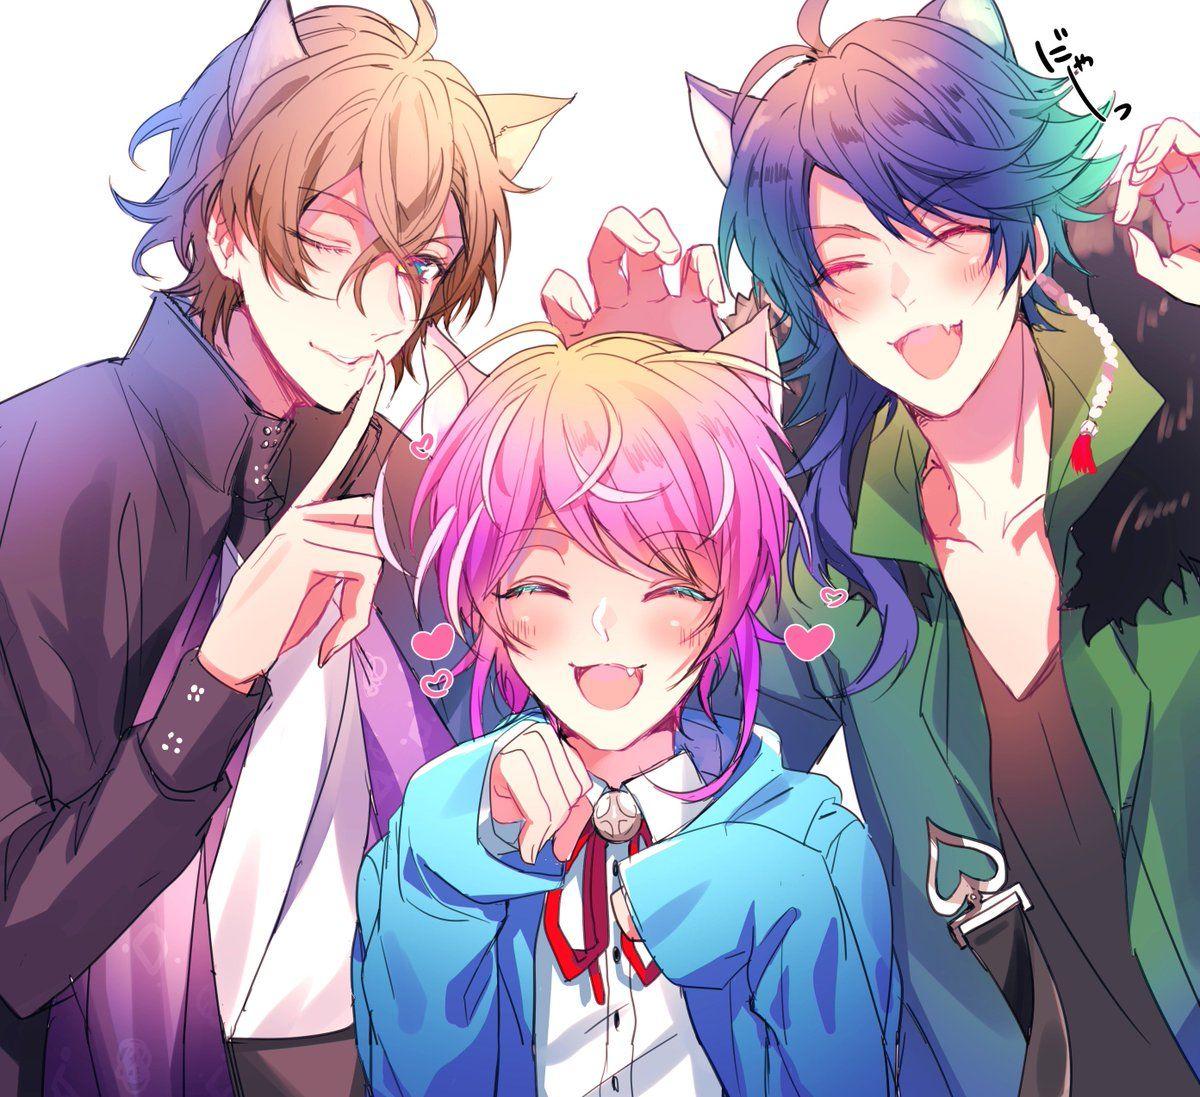 ruina🌸は低浮上中 on Anime friendship, Anime guys, Cute anime boy